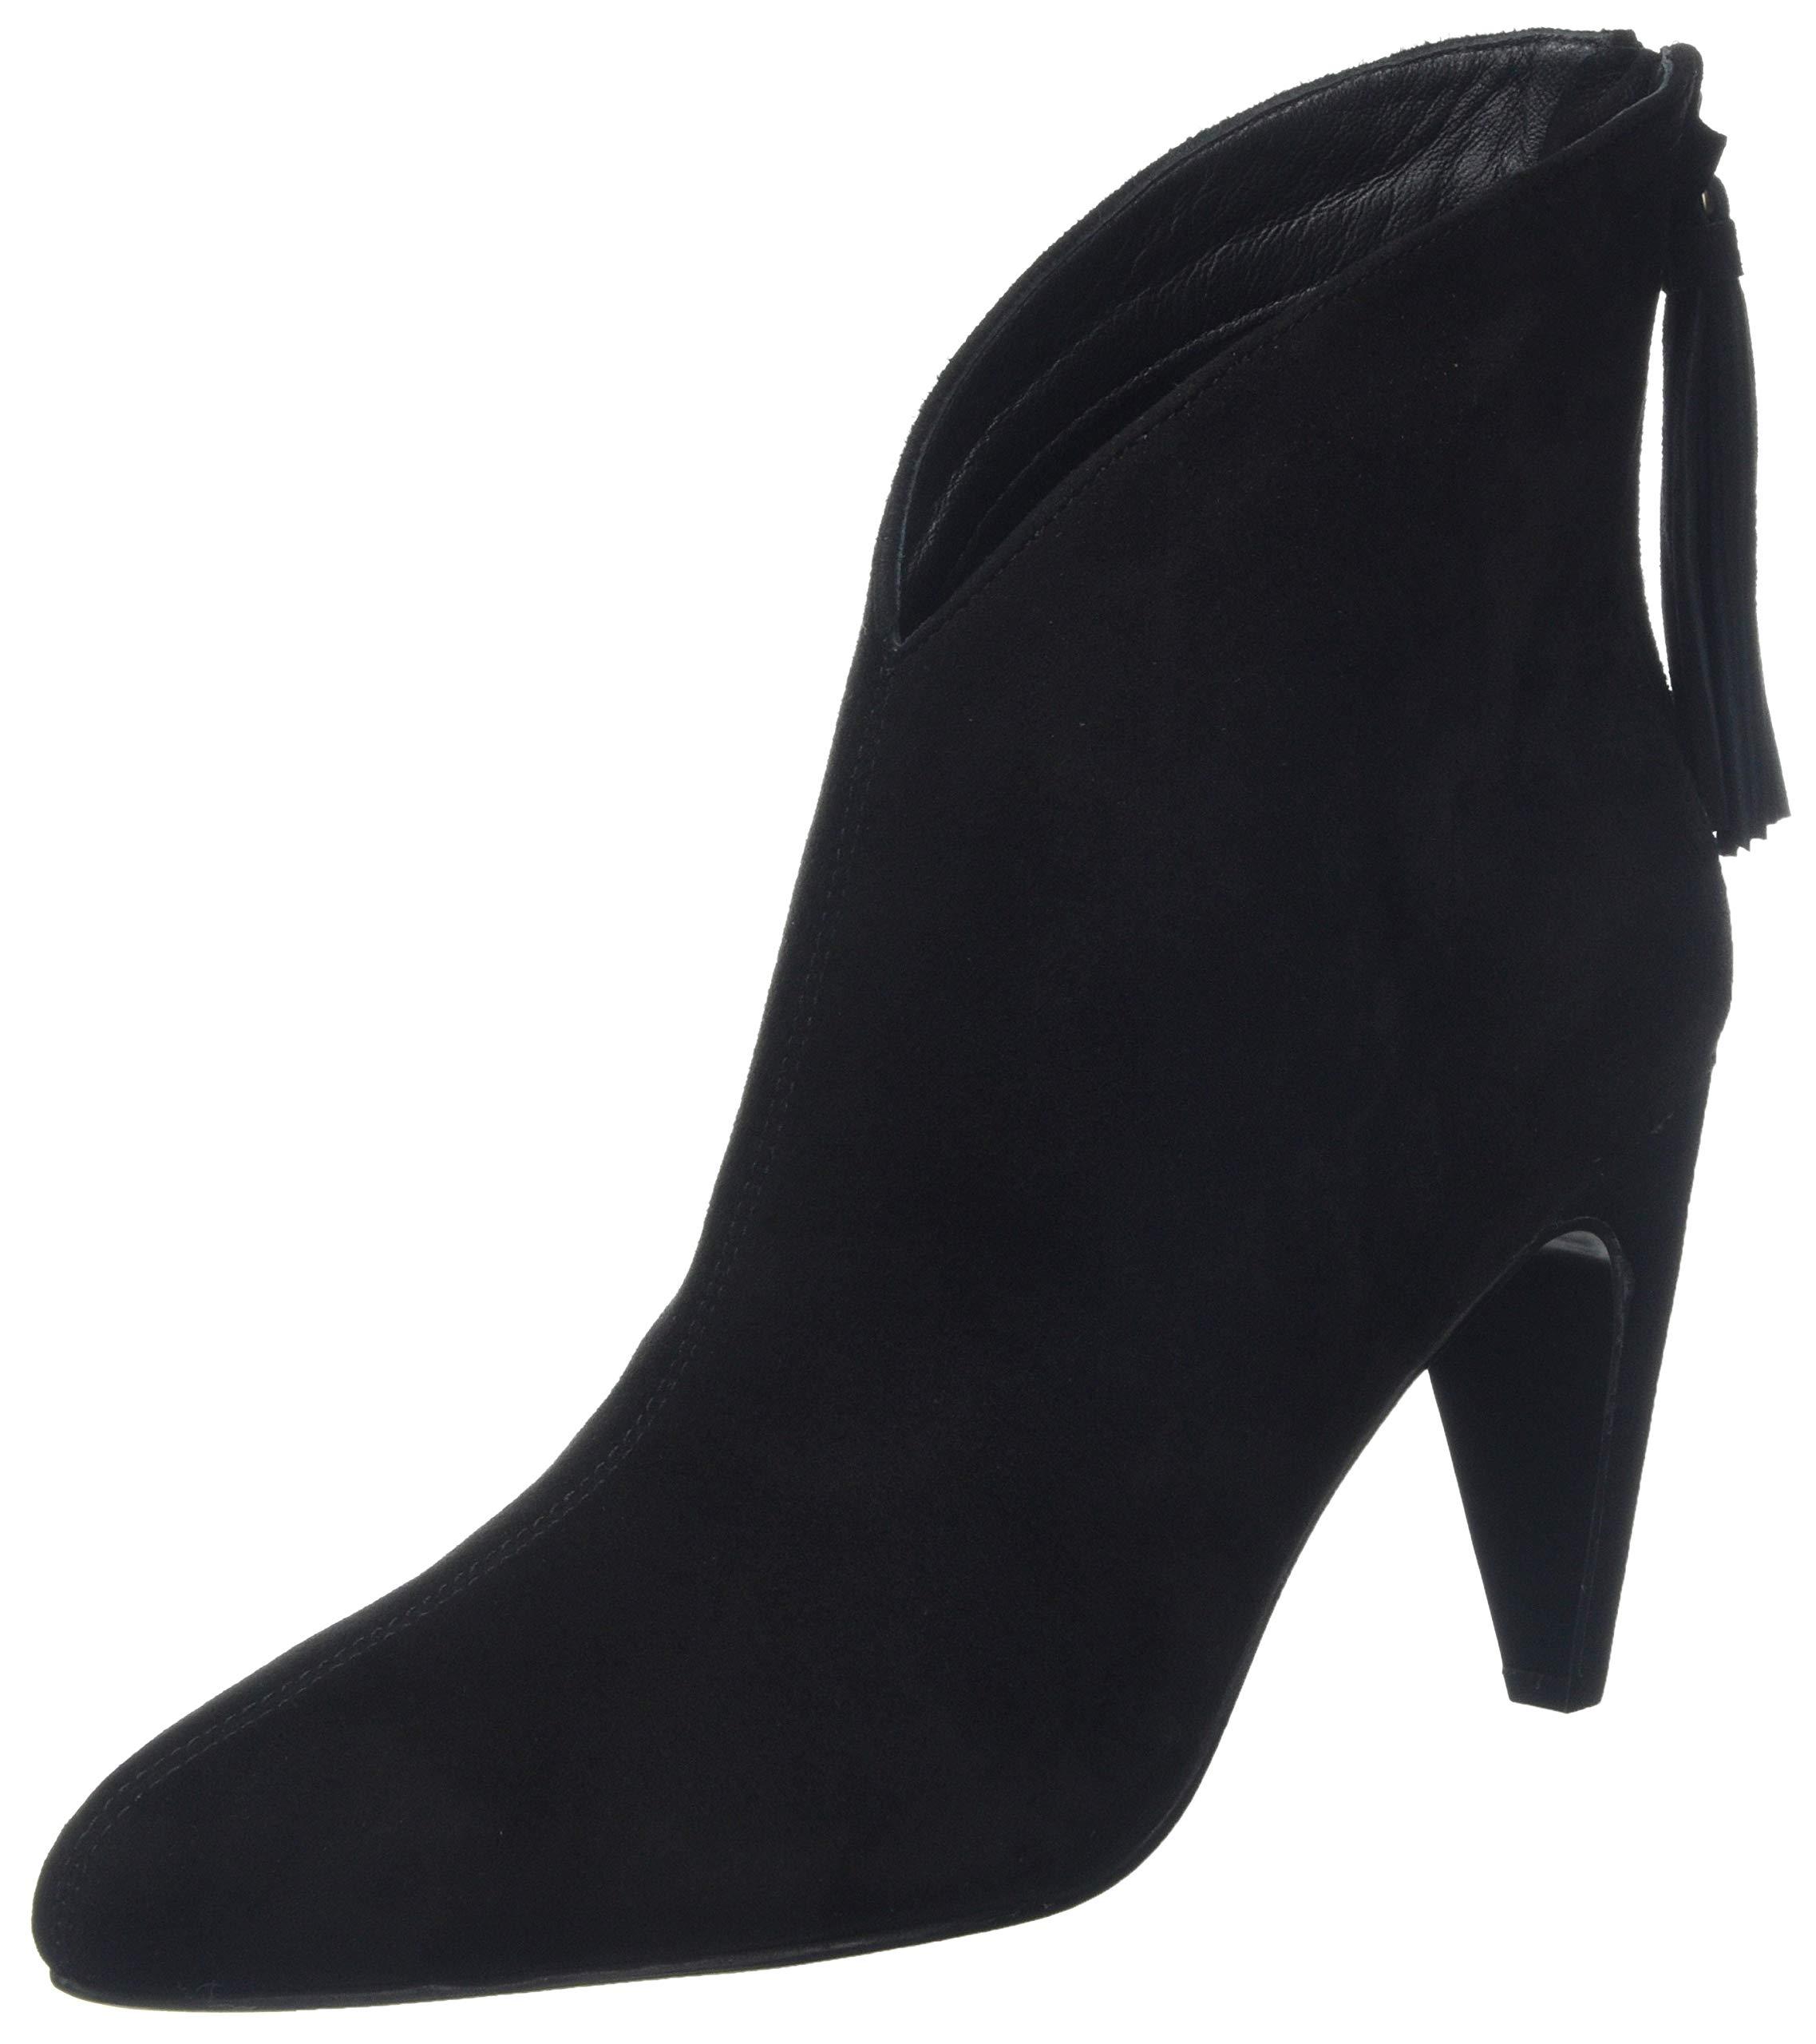 Classiques Eu Limited BootsBottes Tassel Millen Karen Ankle FemmeNoirblack 0139 Fashions N80wOnvm